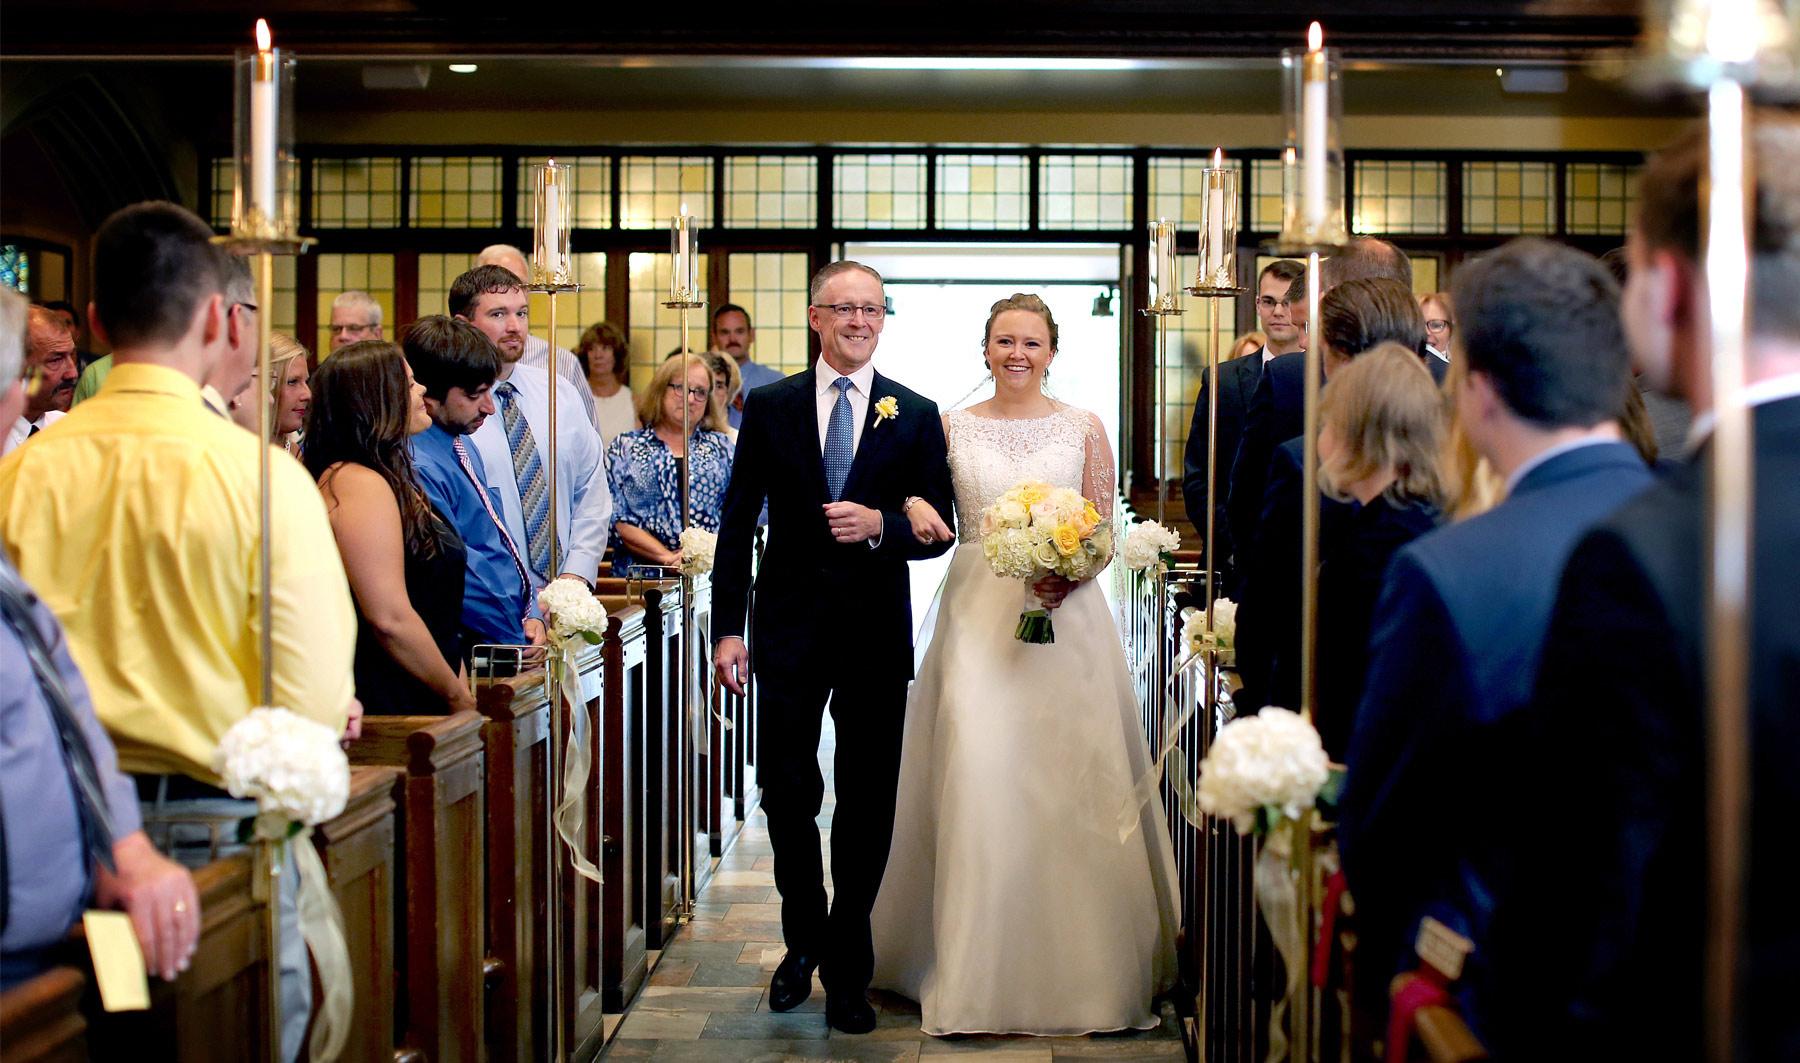 07-Minneapolis-Minnesota-Wedding-Photography-by-Vick-Photography-Edina-Bethlehem-Lutheran-Church-Ceremony-Grace-&-Nick.jpg